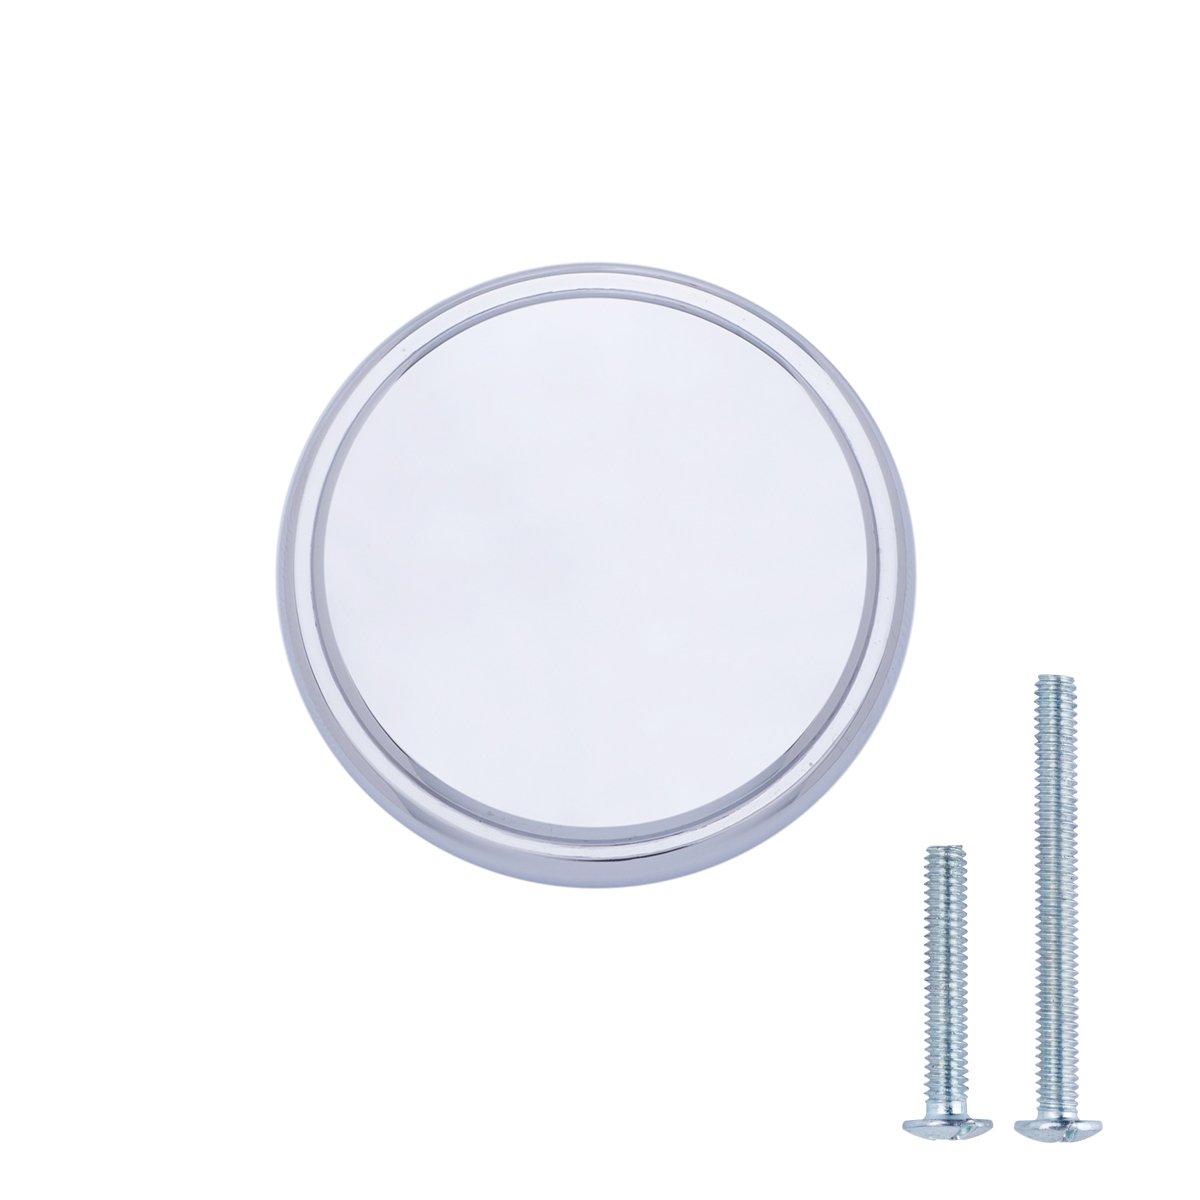 AmazonBasics Modern Wide Top Ring Cabinet Knob, 1.52'' Diameter, Polished Chrome, 10-Pack